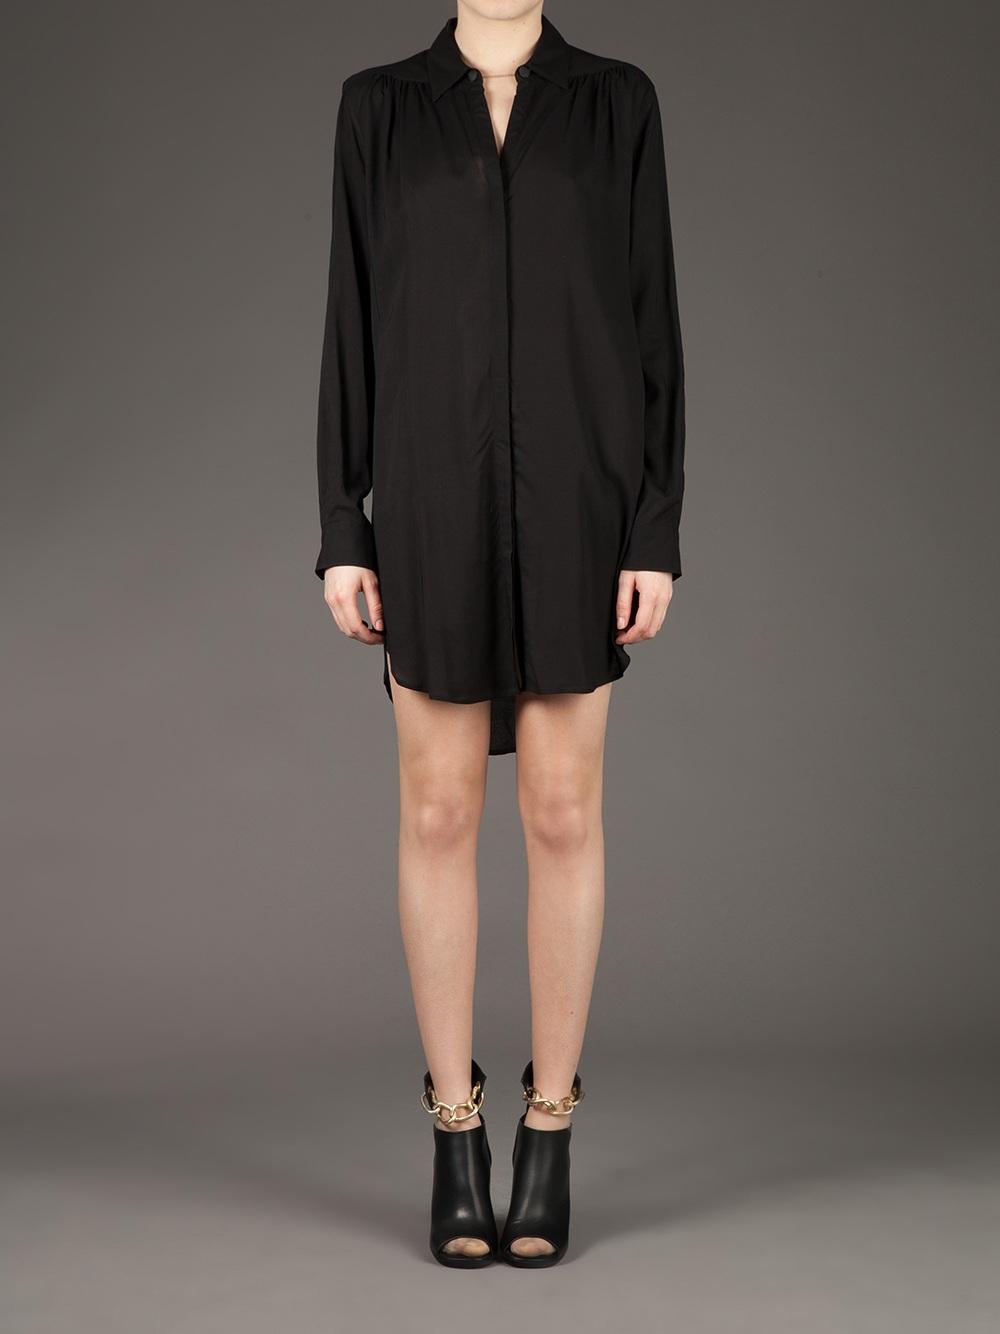 Ann demeulemeester Shirt Dress in Black   Lyst